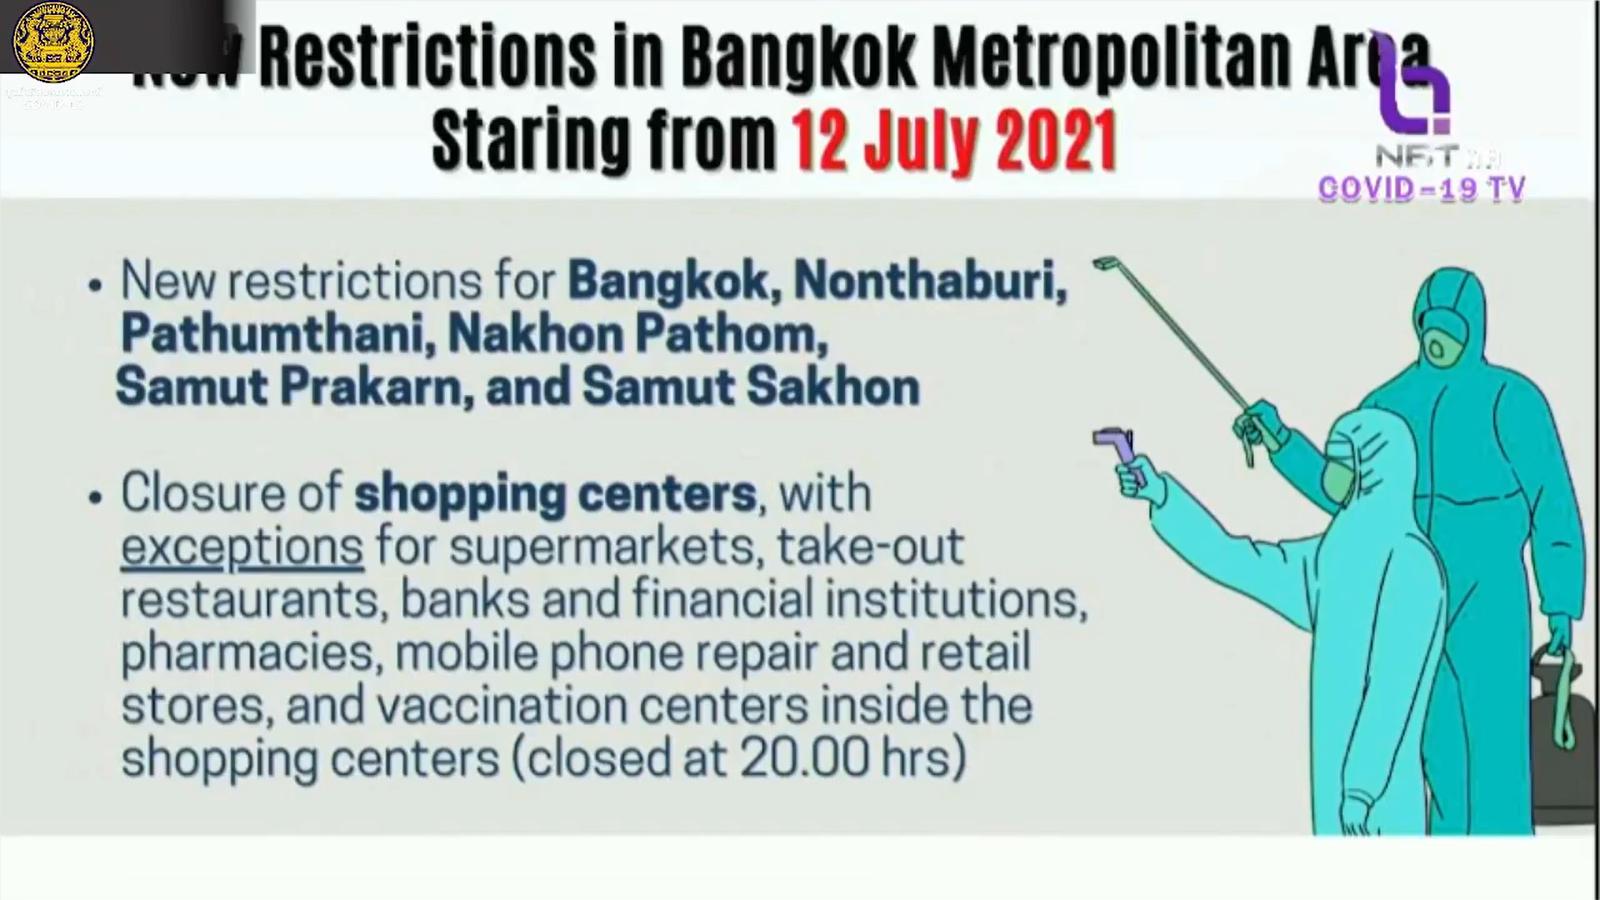 www.thaiguide.dk/images/forum/covid19/nedlukning%20BKK%201%2009-07-21.png